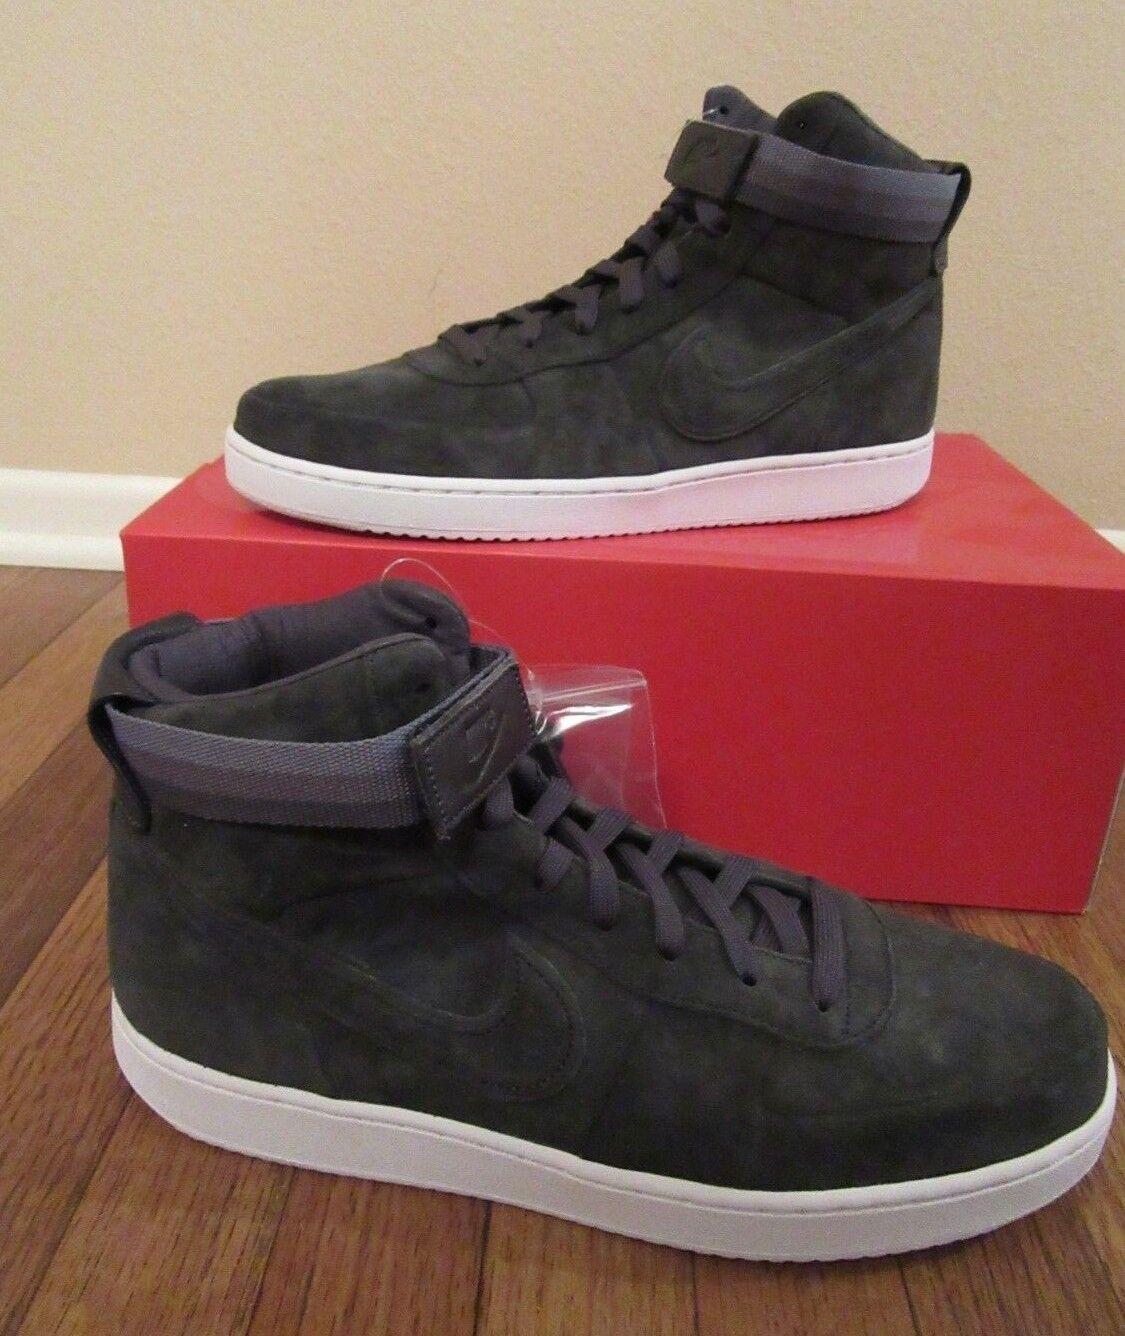 Nike Vandal High PRM Size 11.5 Anthracite White AH7171 002 John Elliott New NIB